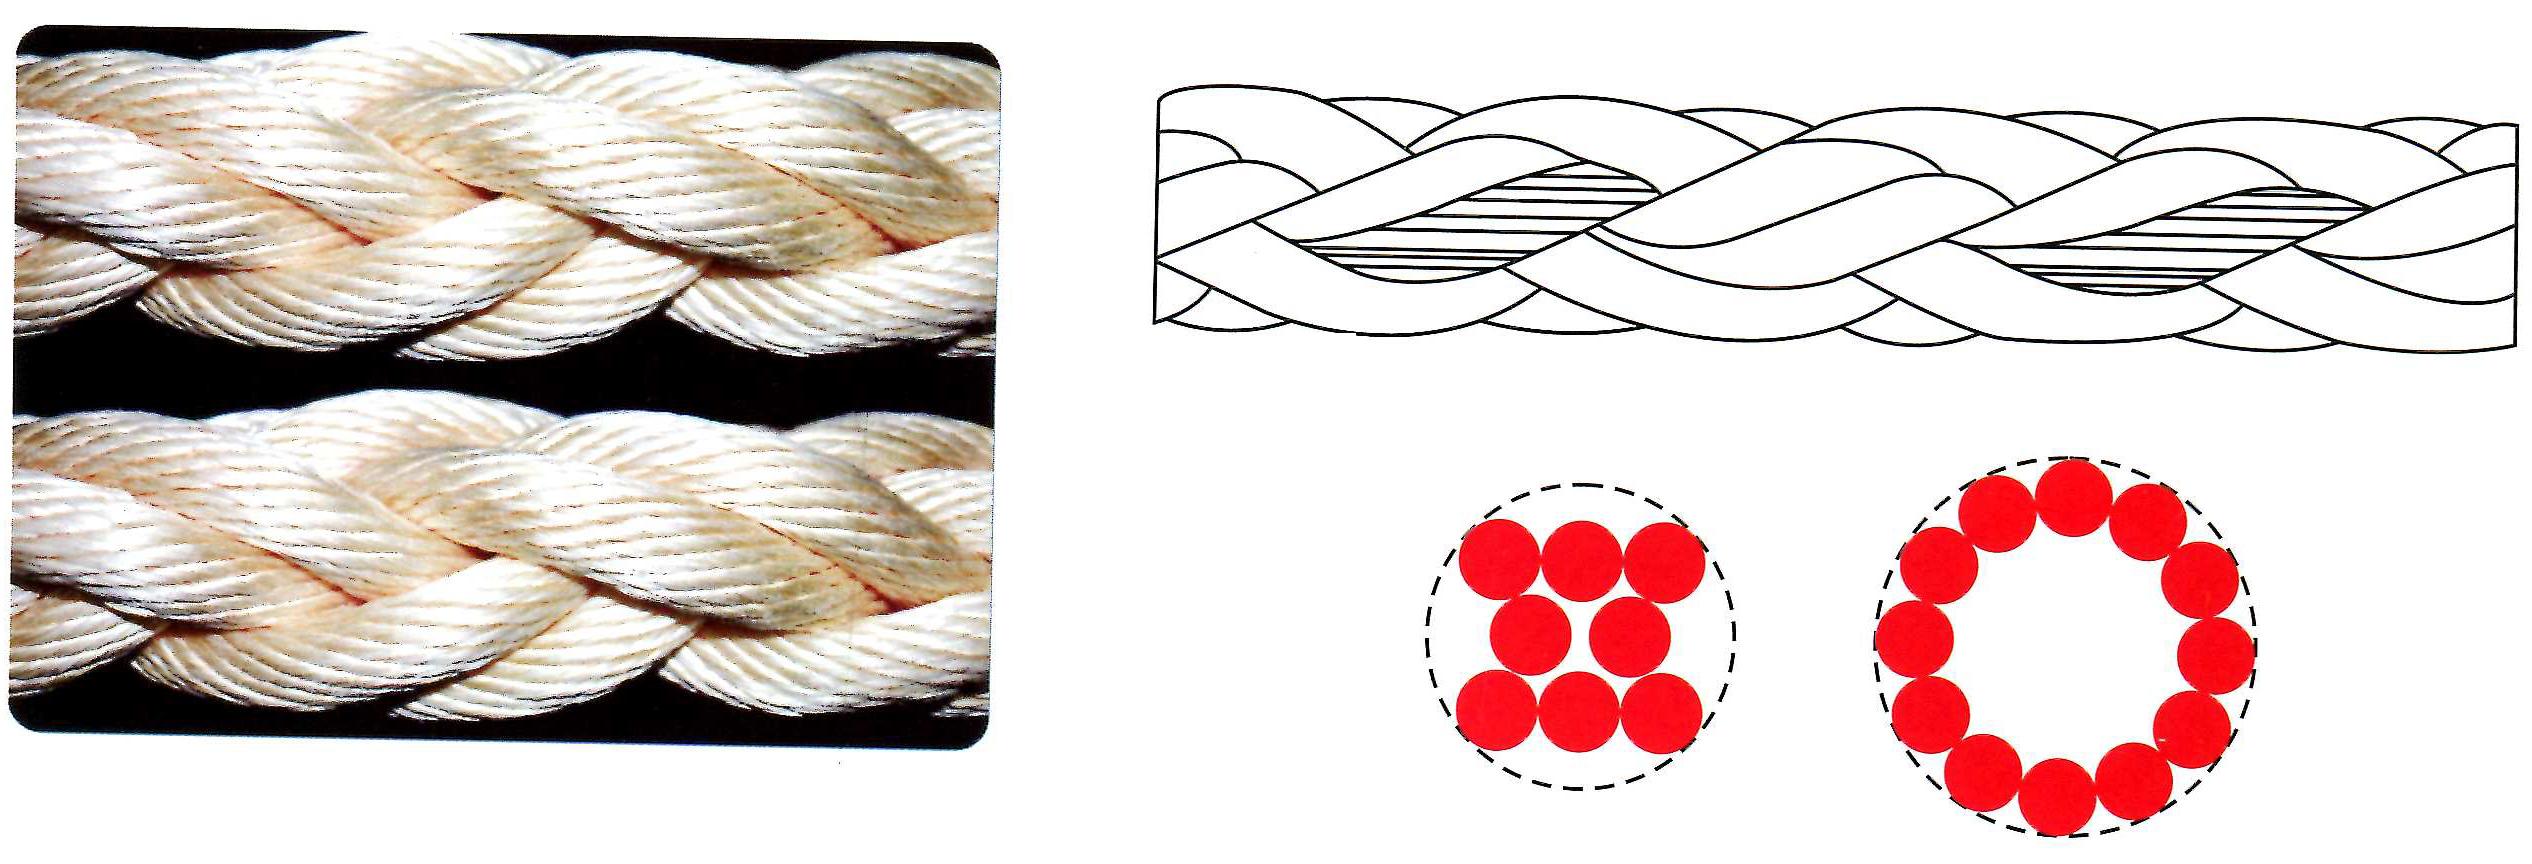 High tensity yarn